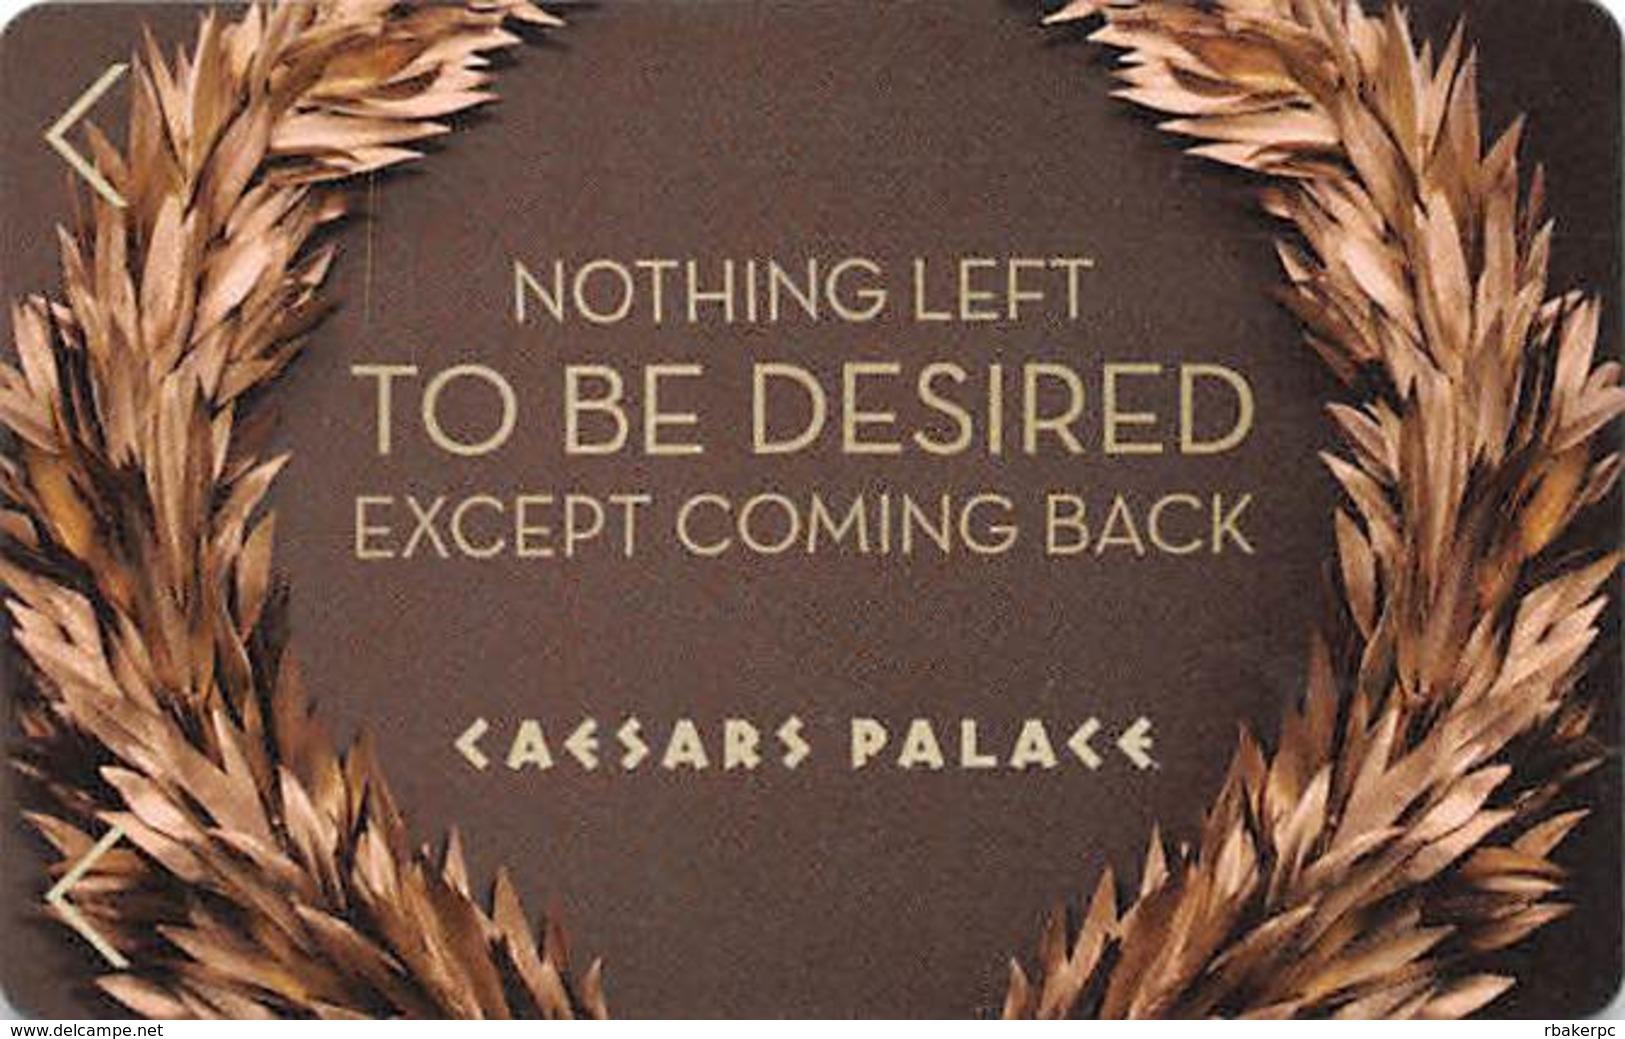 Caesars Palace Casino Las Vegas Hotel Room Key Card With C3-4146114 - Hotel Keycards